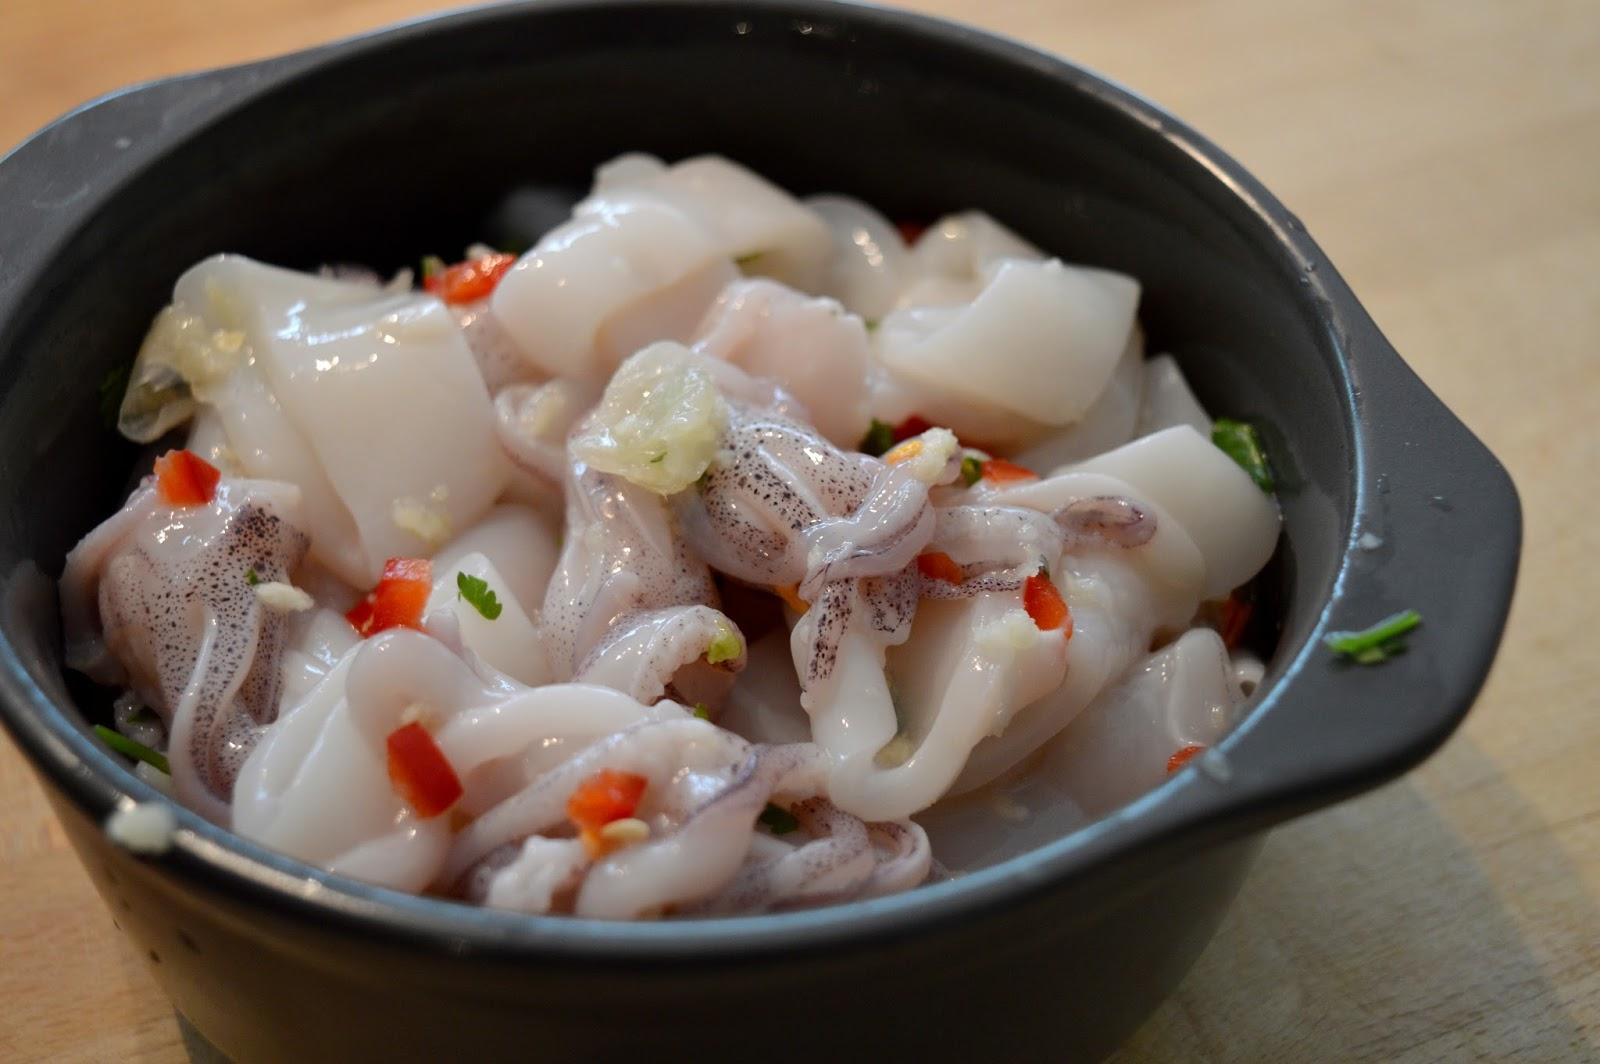 I Sea Pasta review, squid and seaweed pasta recipe, UK food blog, food bloggers